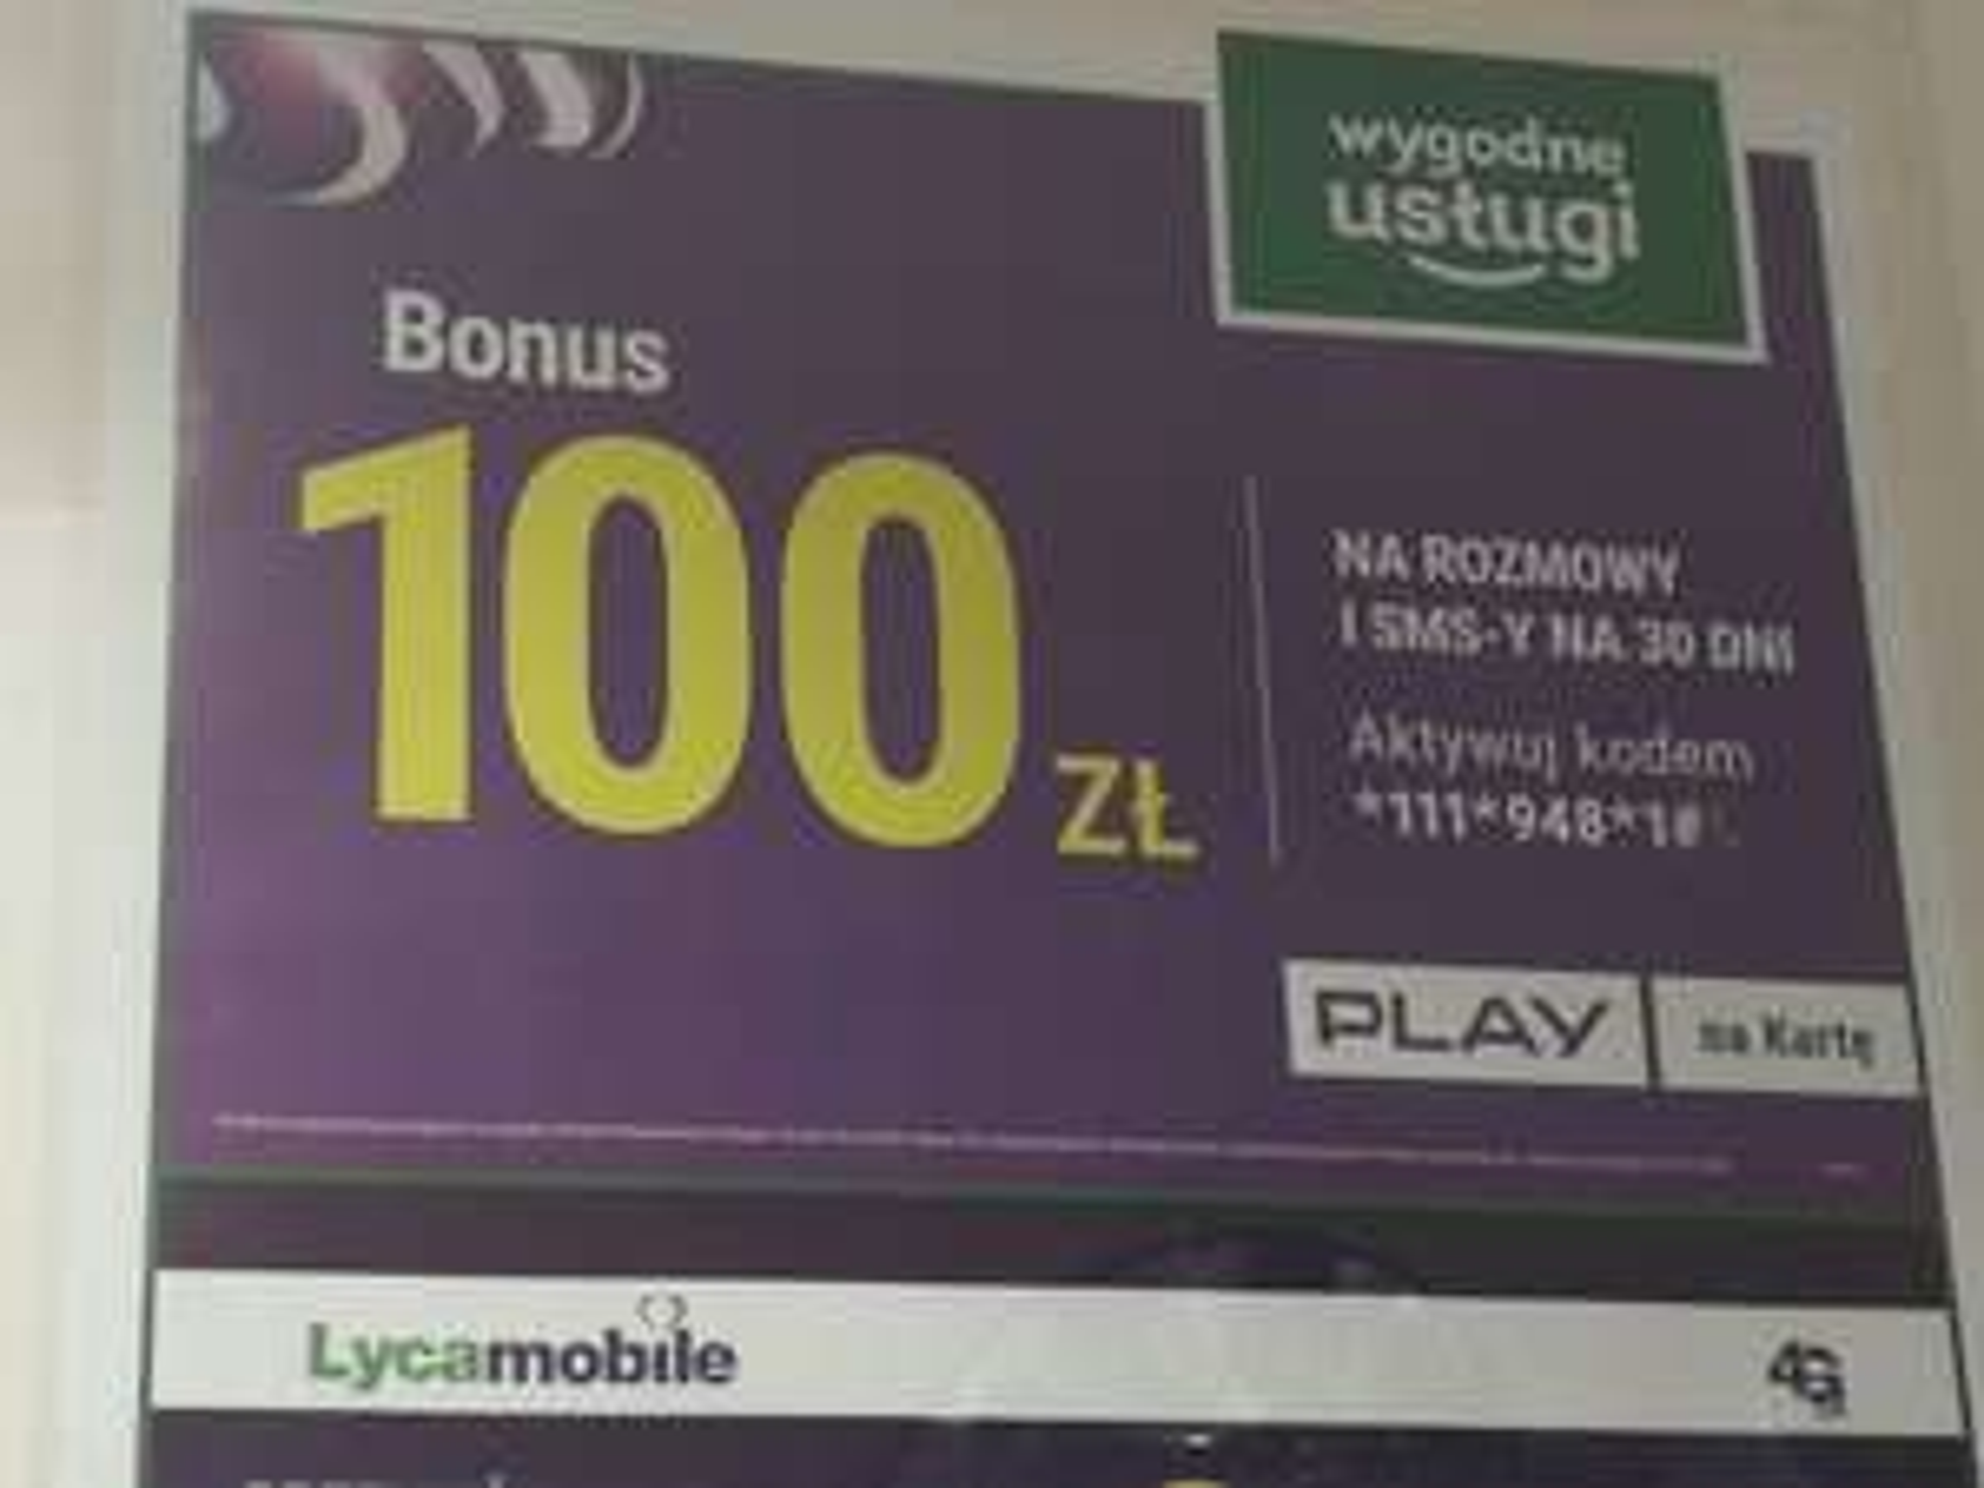 Bonus 100 zł PLAY